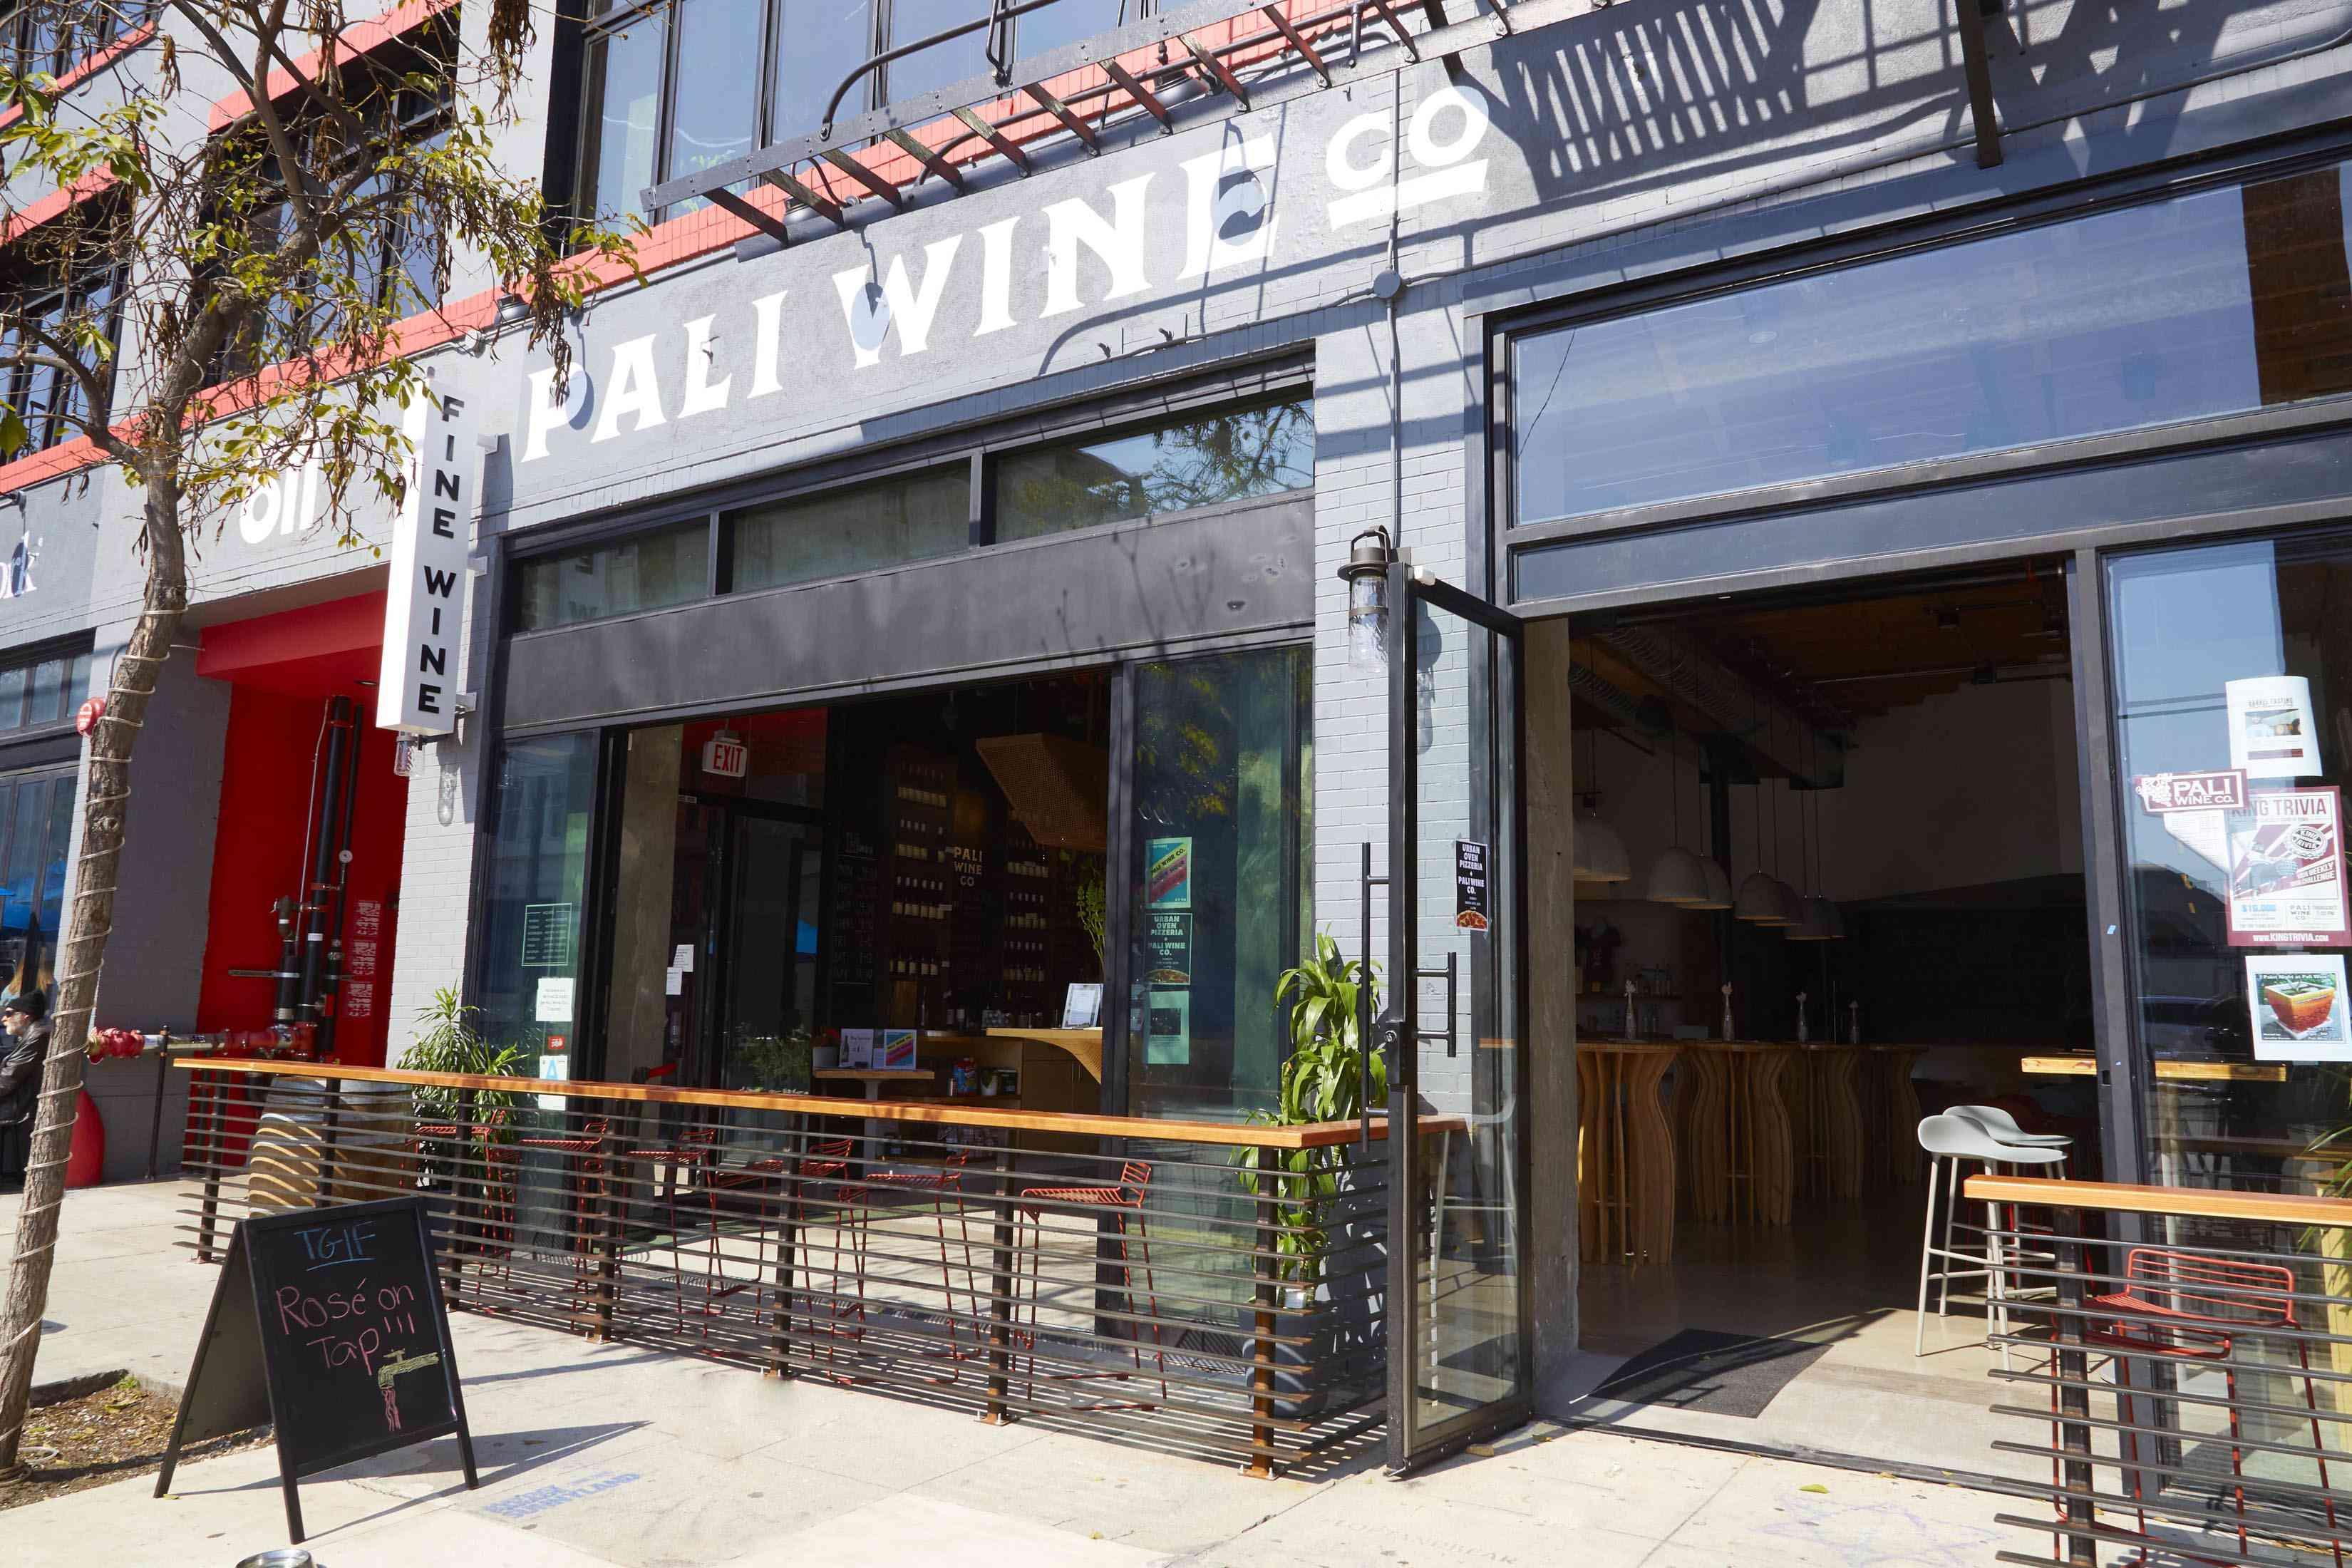 Pali Wine Co. exterior